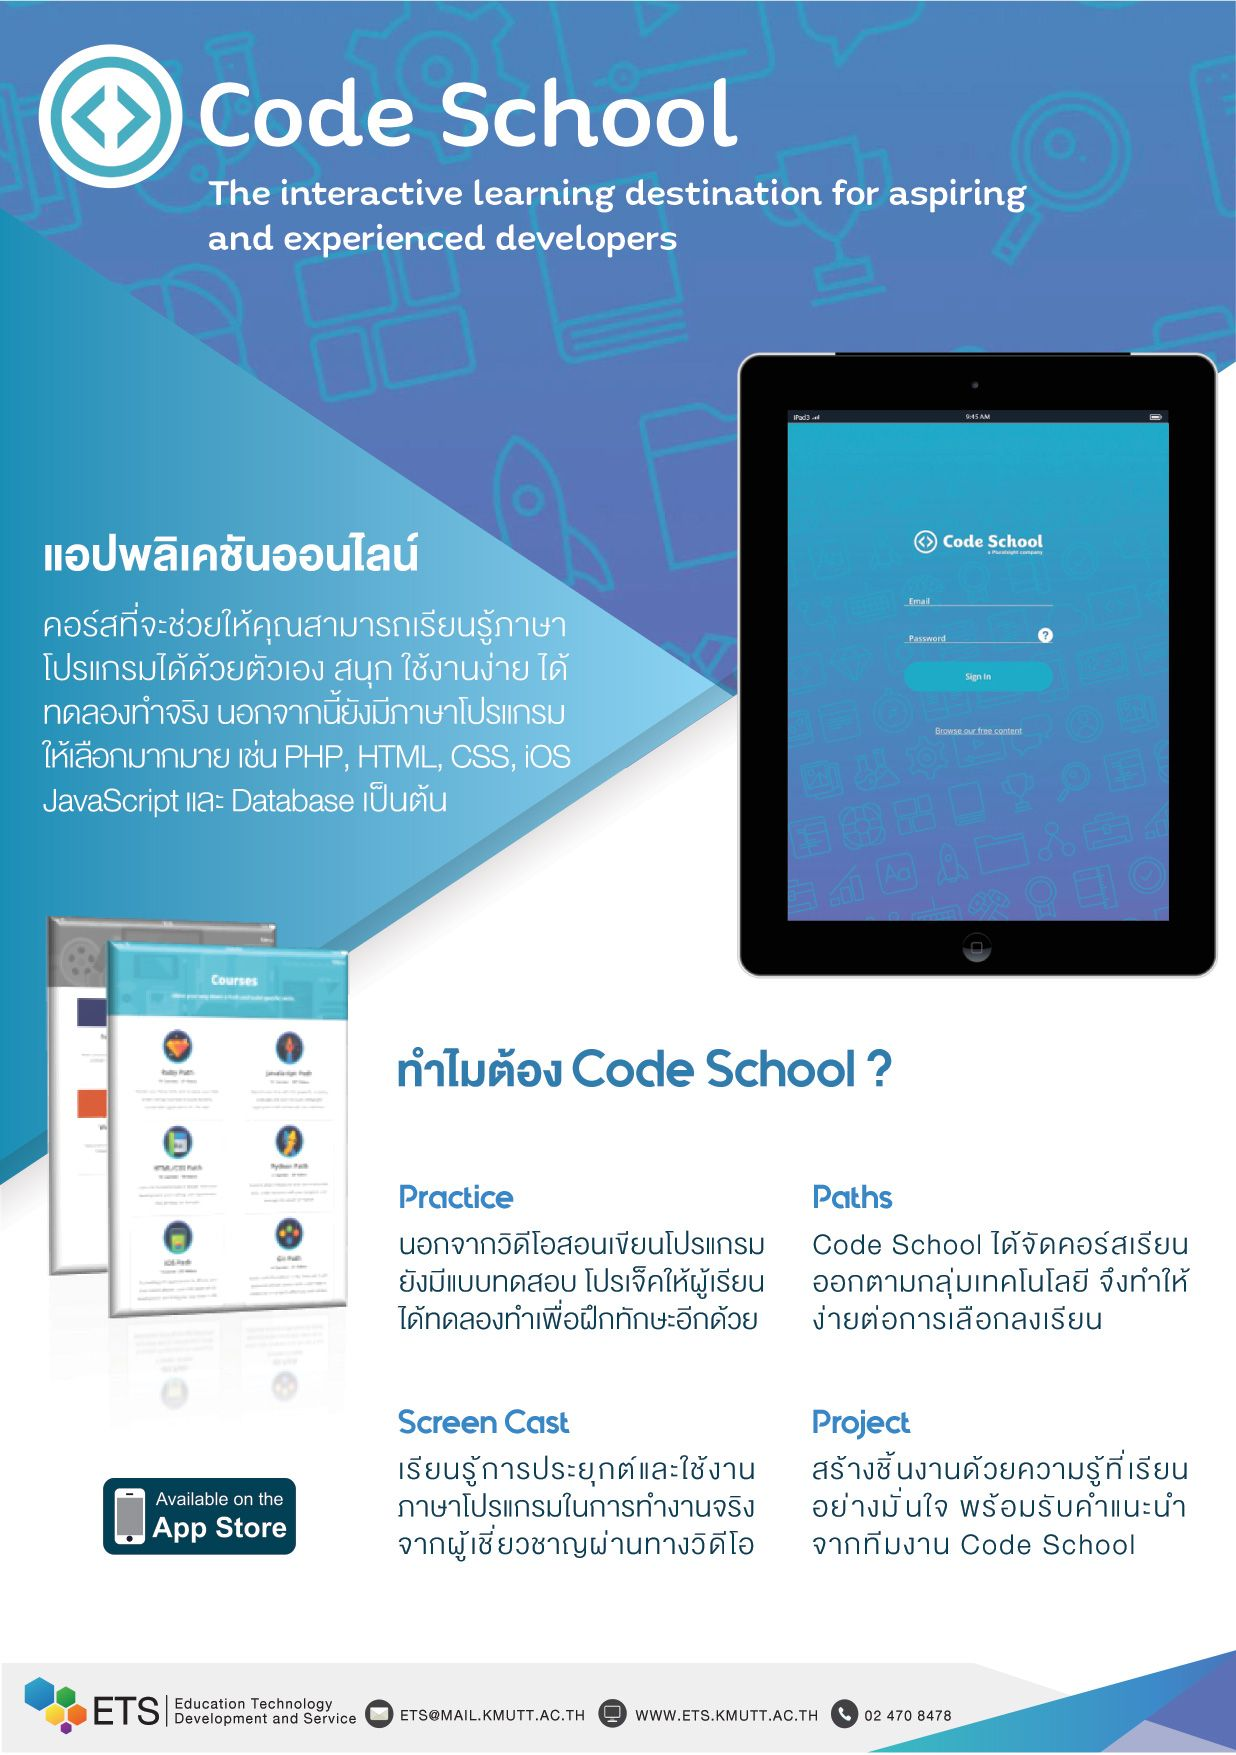 Code School - Knowledge exploration #ETSAppreview #etsappreview #PHP